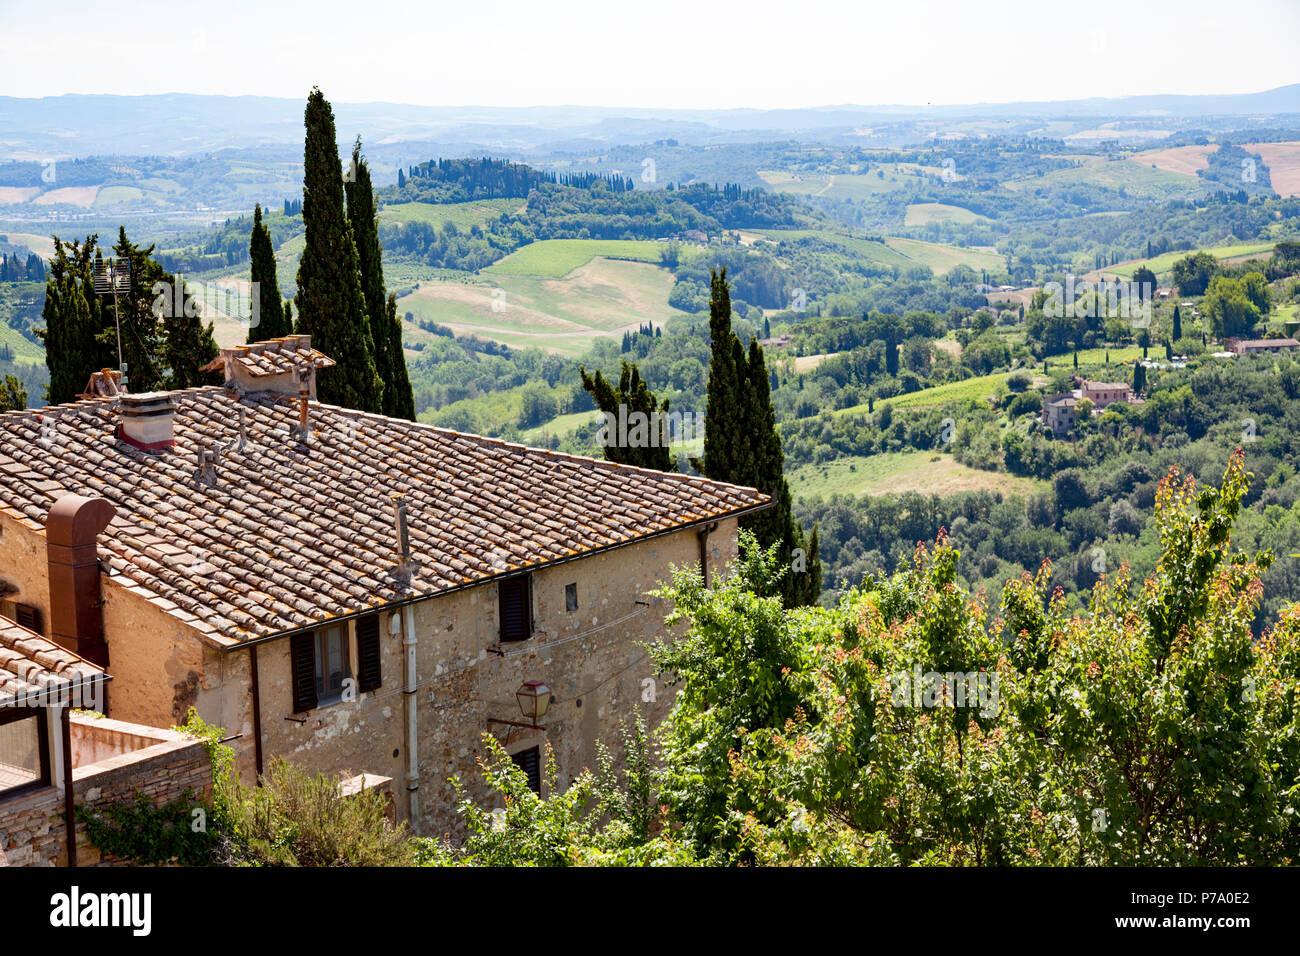 At San Gimignano, a sight on the Tuscan landscape from the city tour (Province of Siena - Italy). A San Gimignano, échappée visuelle depuis le tour de - Stock Image